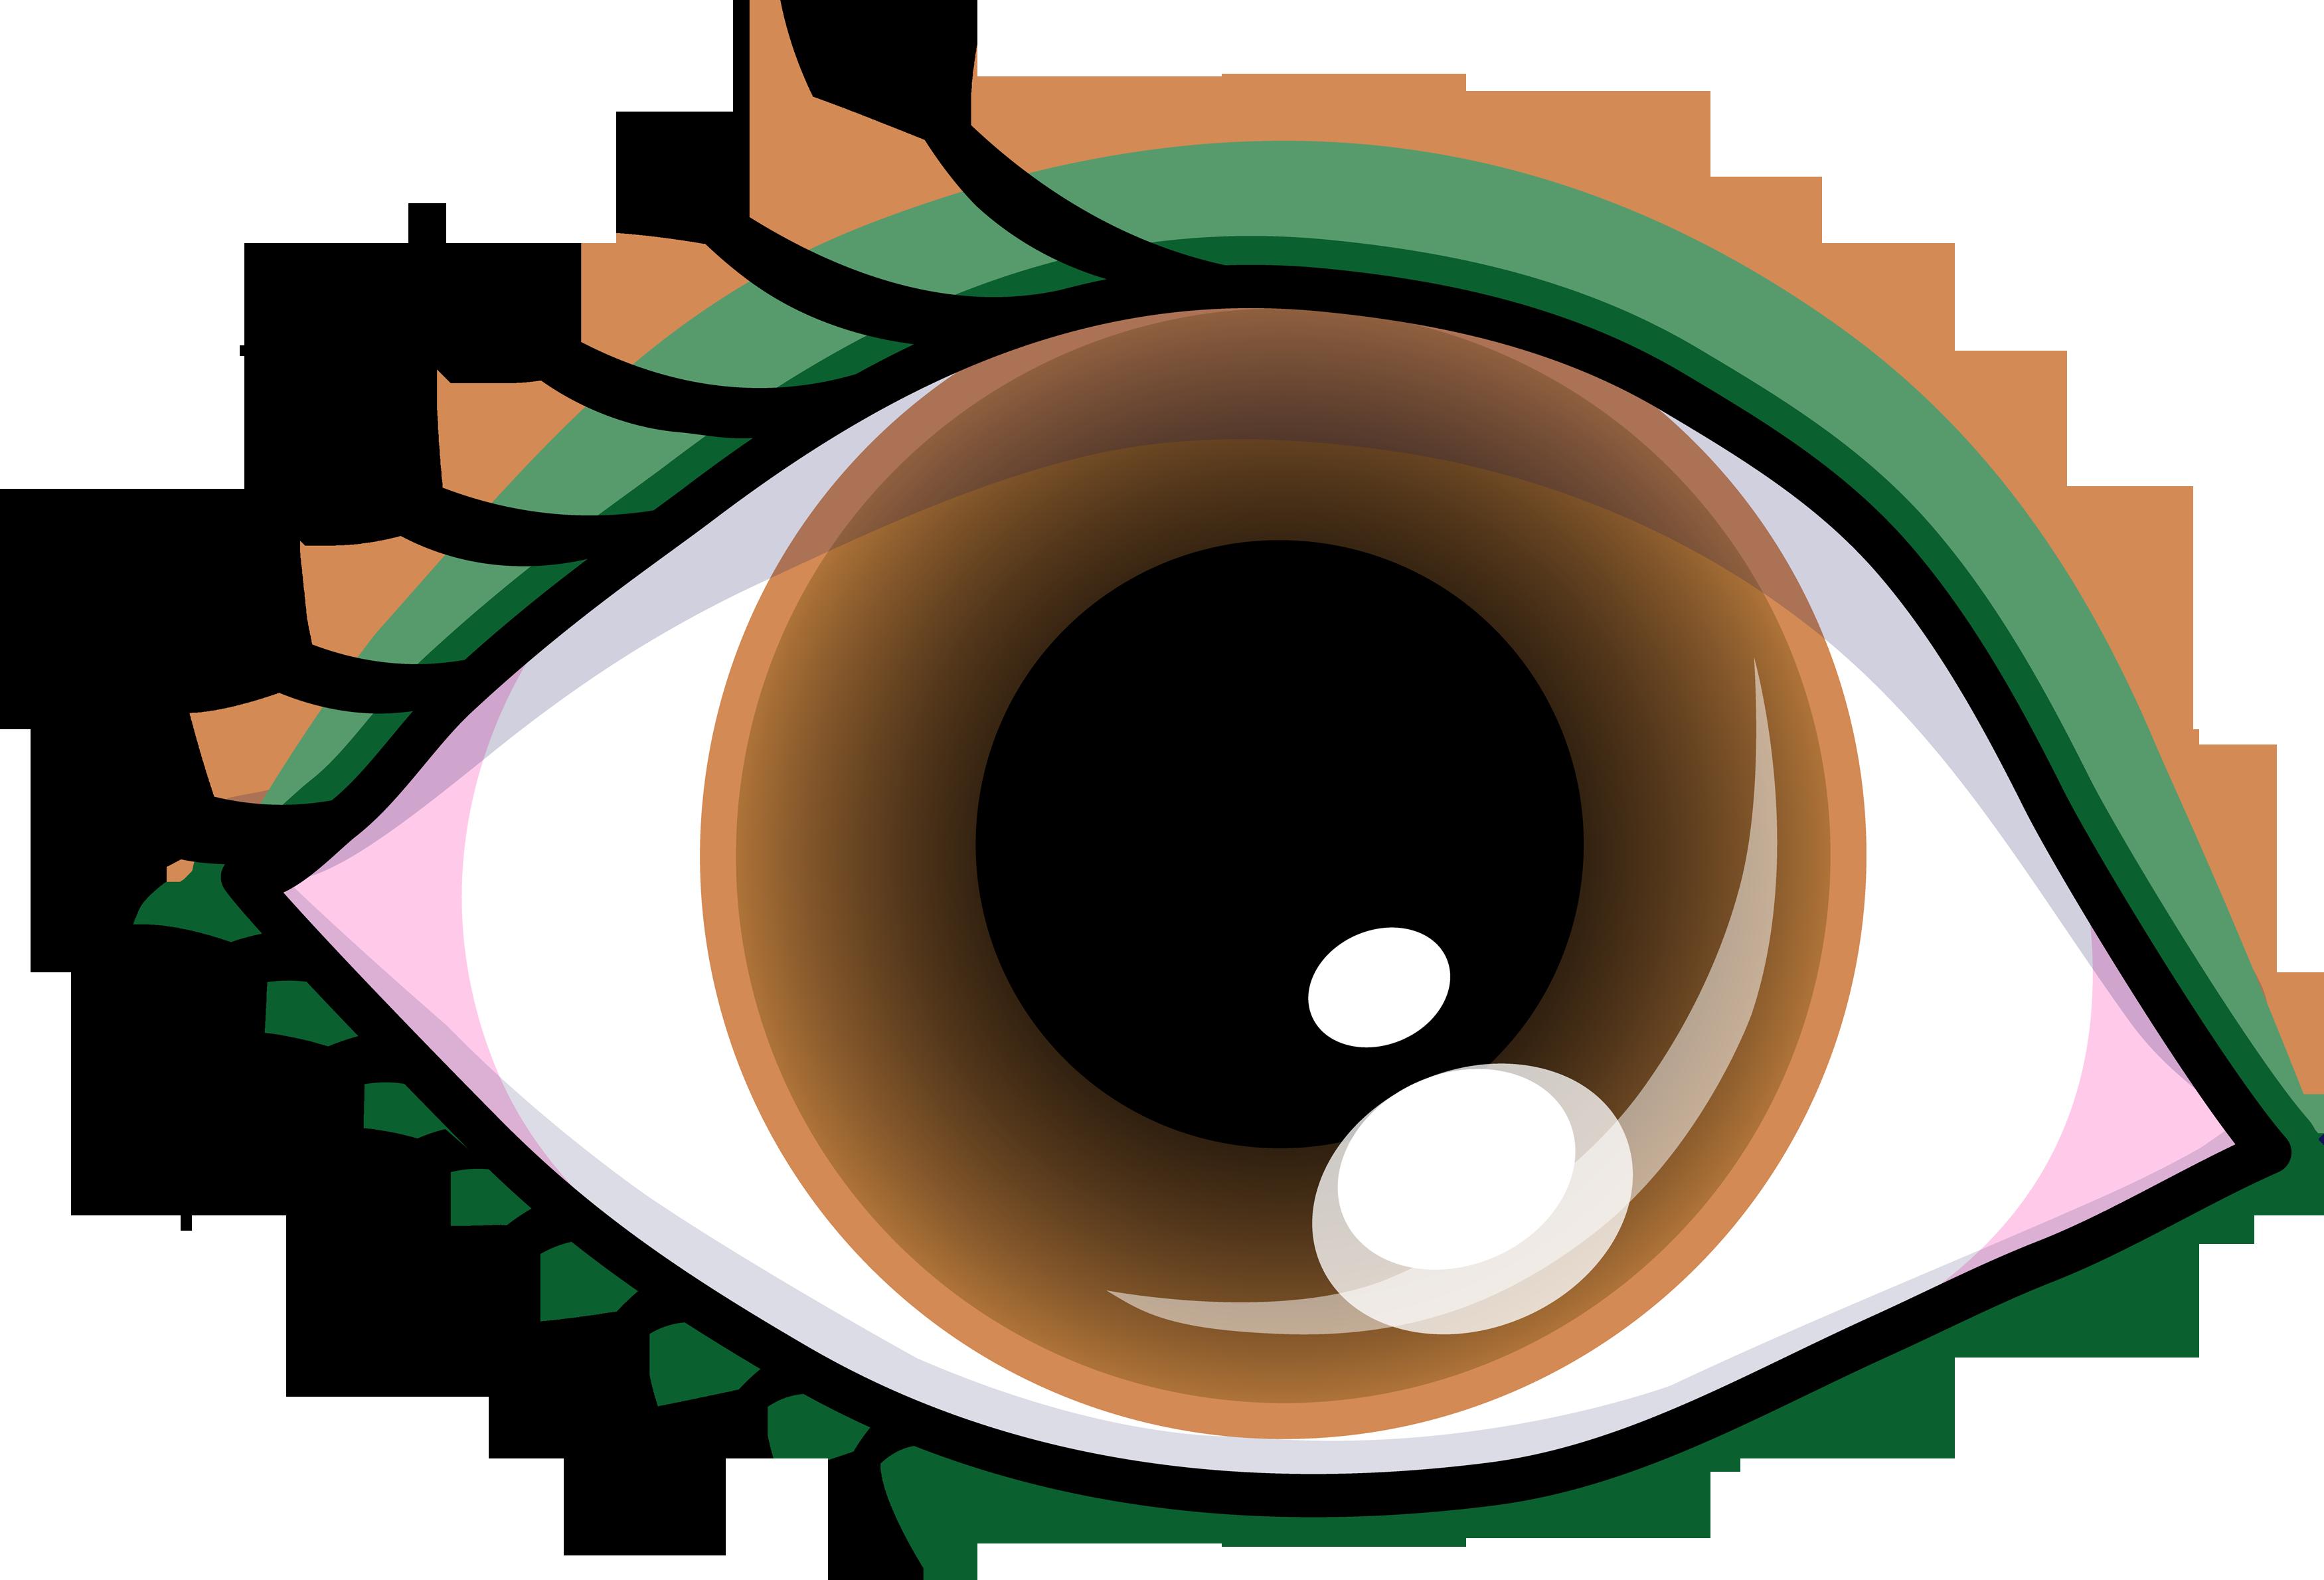 Lady clipart eyes. Makeup jokingart com eye